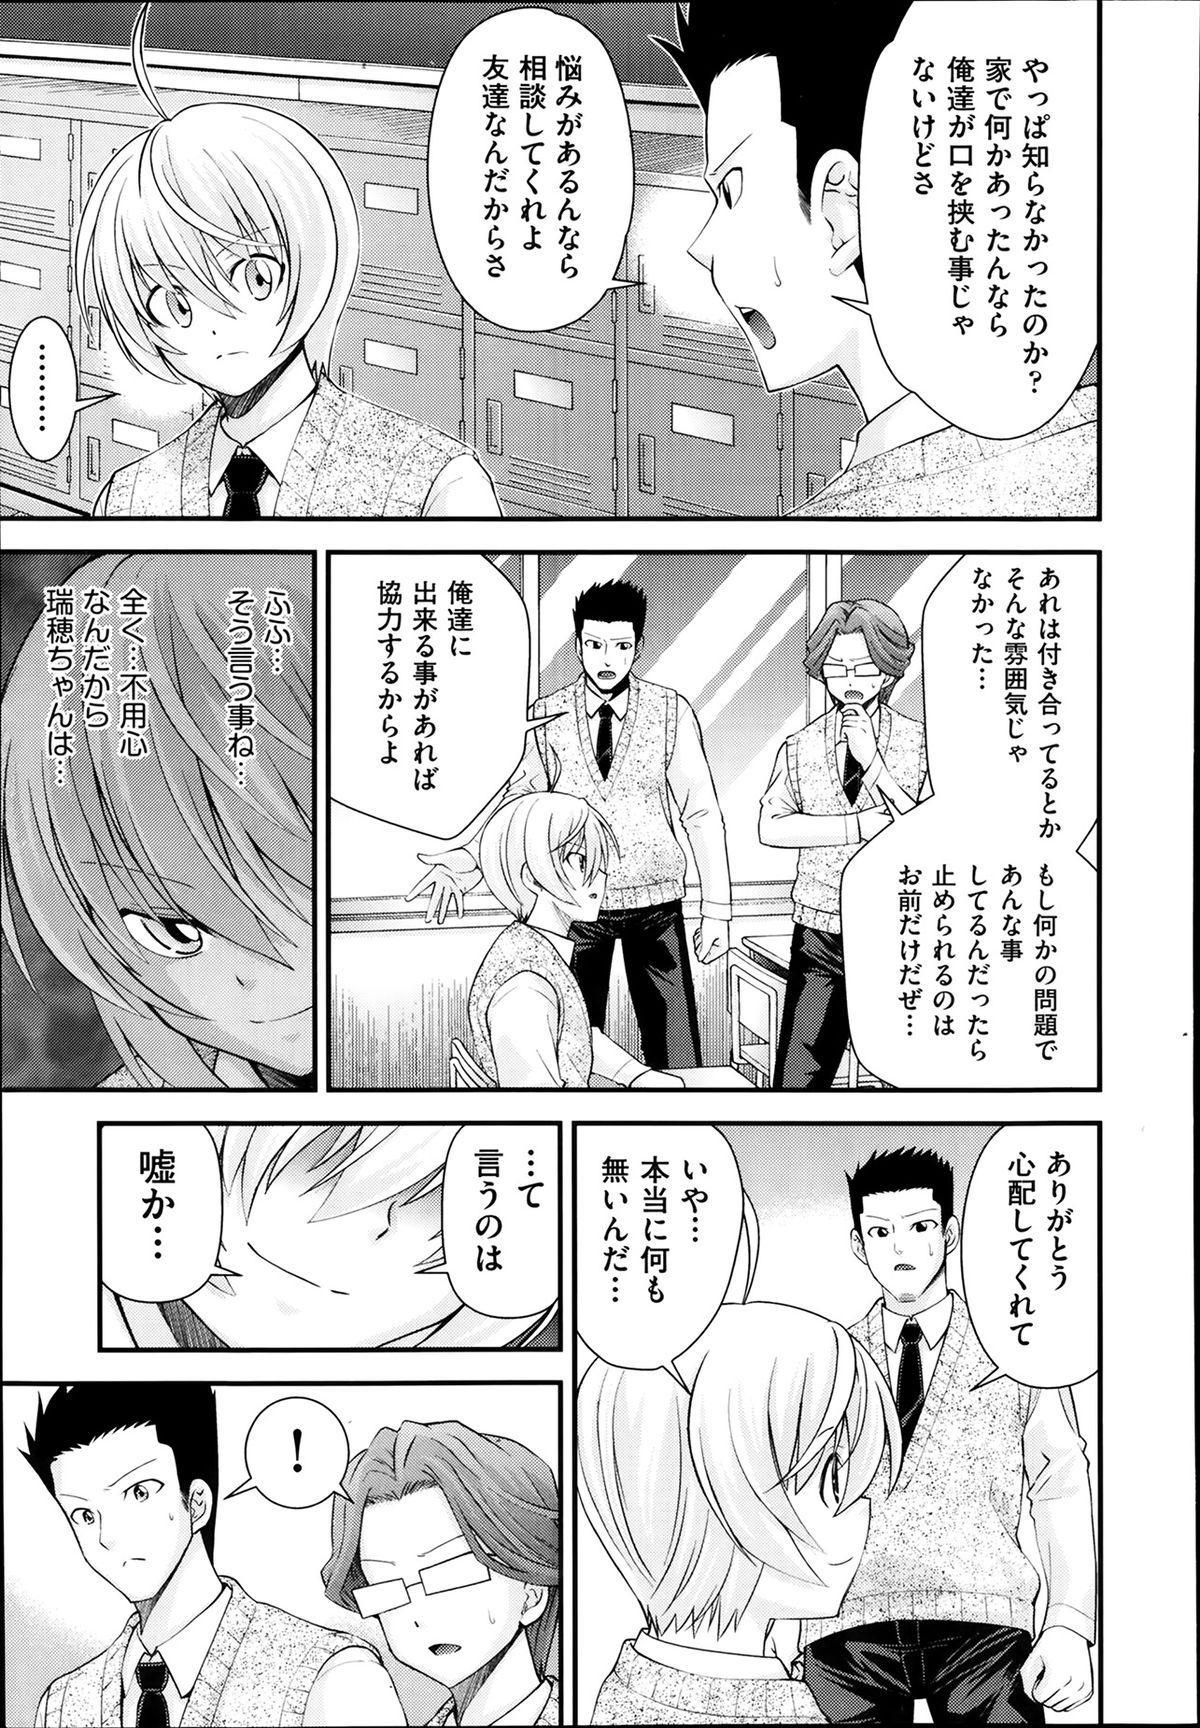 Kyoudai Replace 74